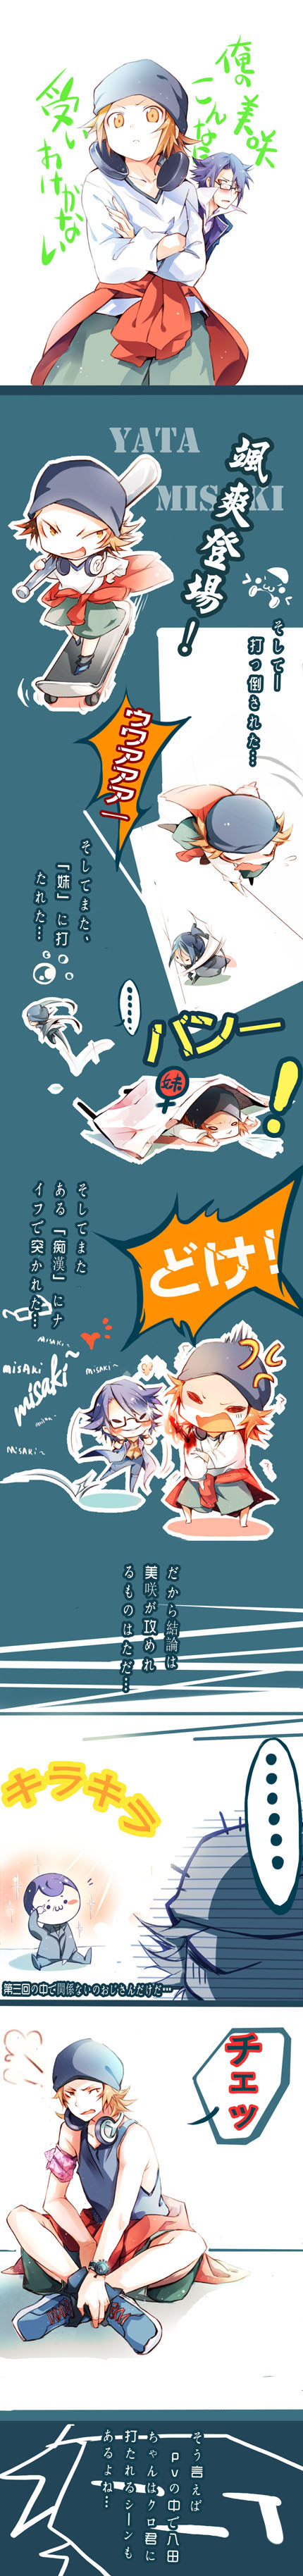 Tags: Anime, Yunie00, K Project, Yata Misaki, Fushimi Saruhiko, Yatogami Kuroh, Ore no Imouto ga Konna ni Kawaii Wake ga Nai (Parody), Pixiv, Fanart, Fanart From Pixiv